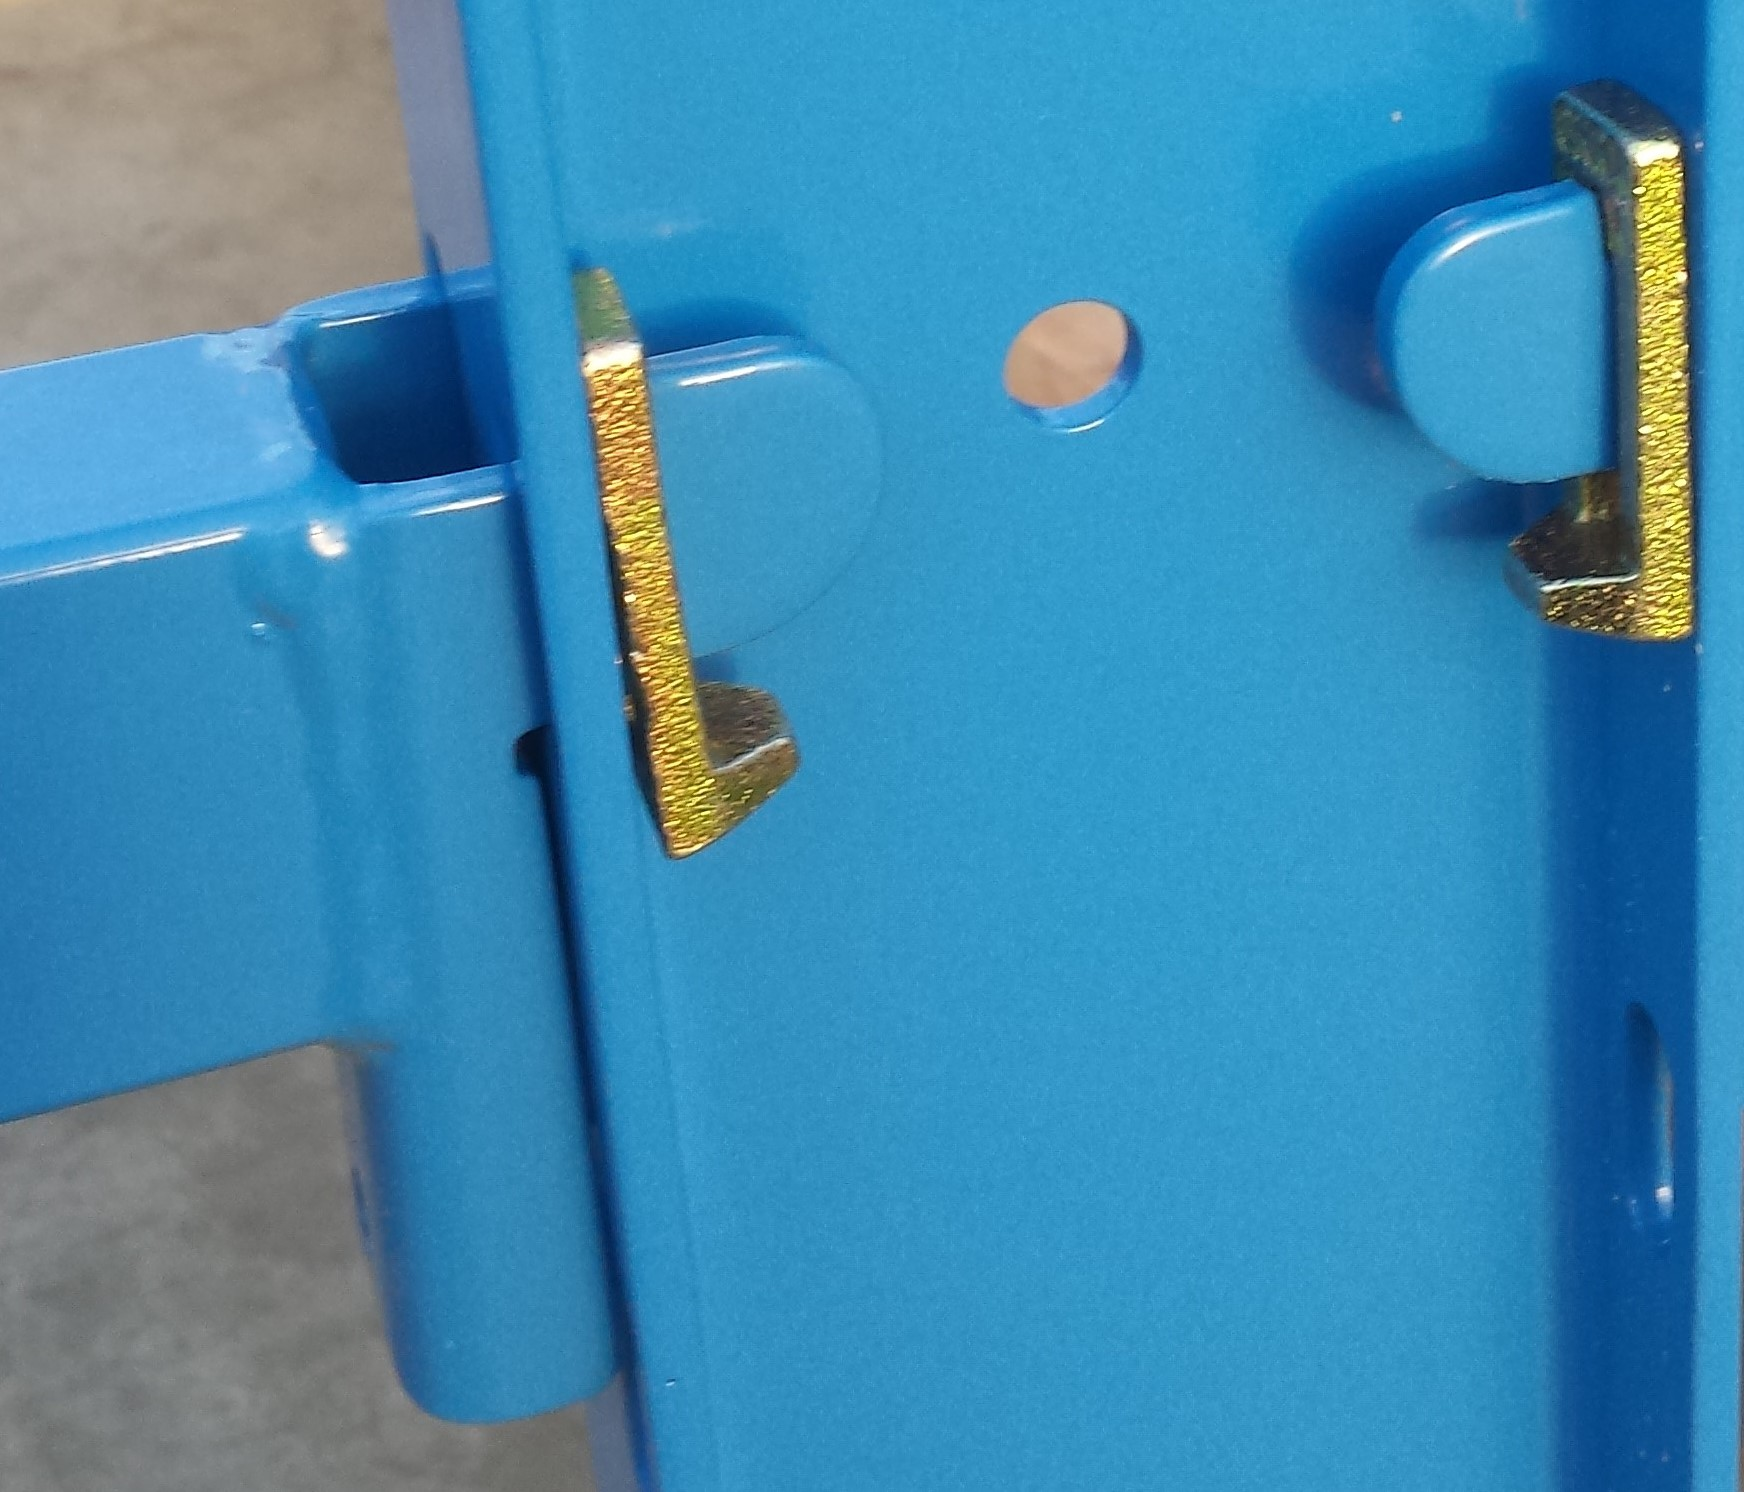 Detail 11. OHRA inhaaksysteem armen draagarmstelling blauw en verzinkt